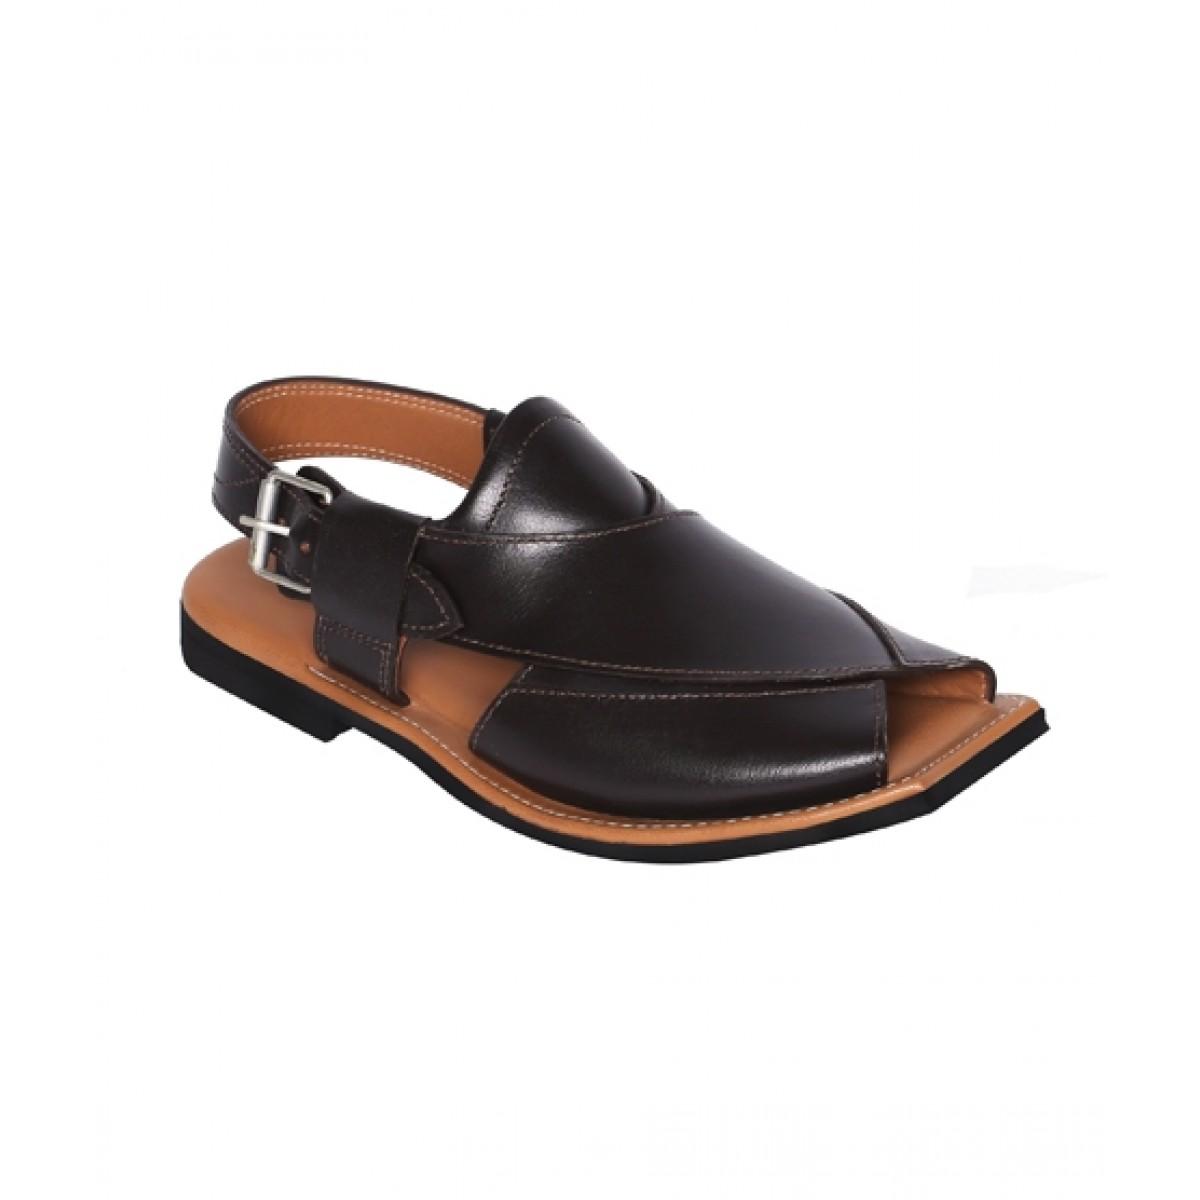 NOVADO Masti Khan Leather Peshawari Sandal For Men Choco Brown (0049)